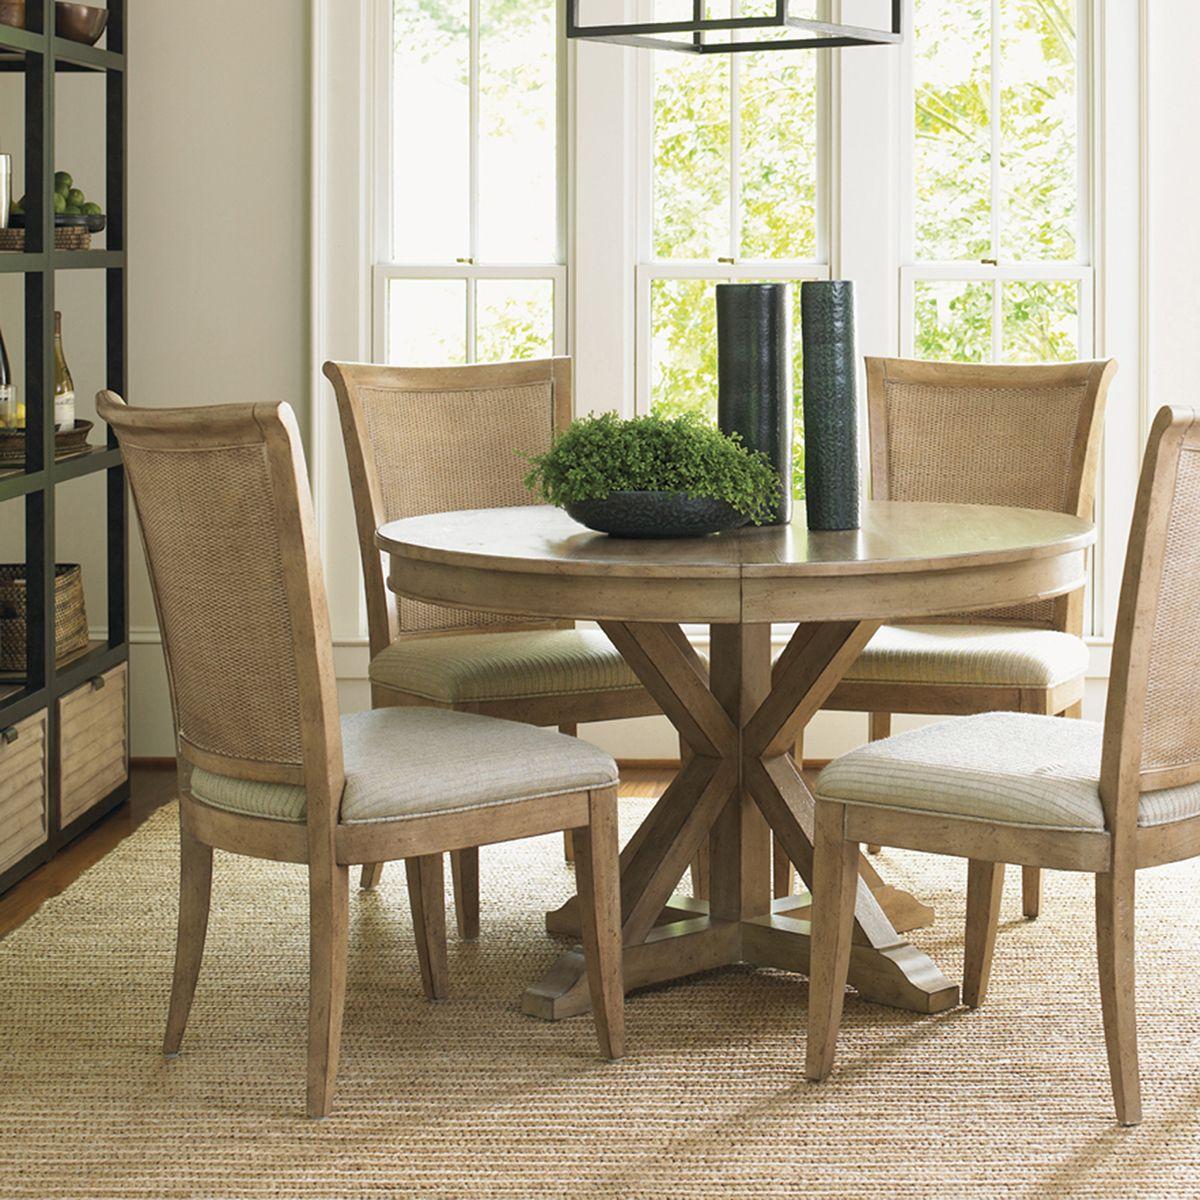 Casual Dining Table Decor: Lexington Monterey Sands San Marcos Dining Table 830-870C